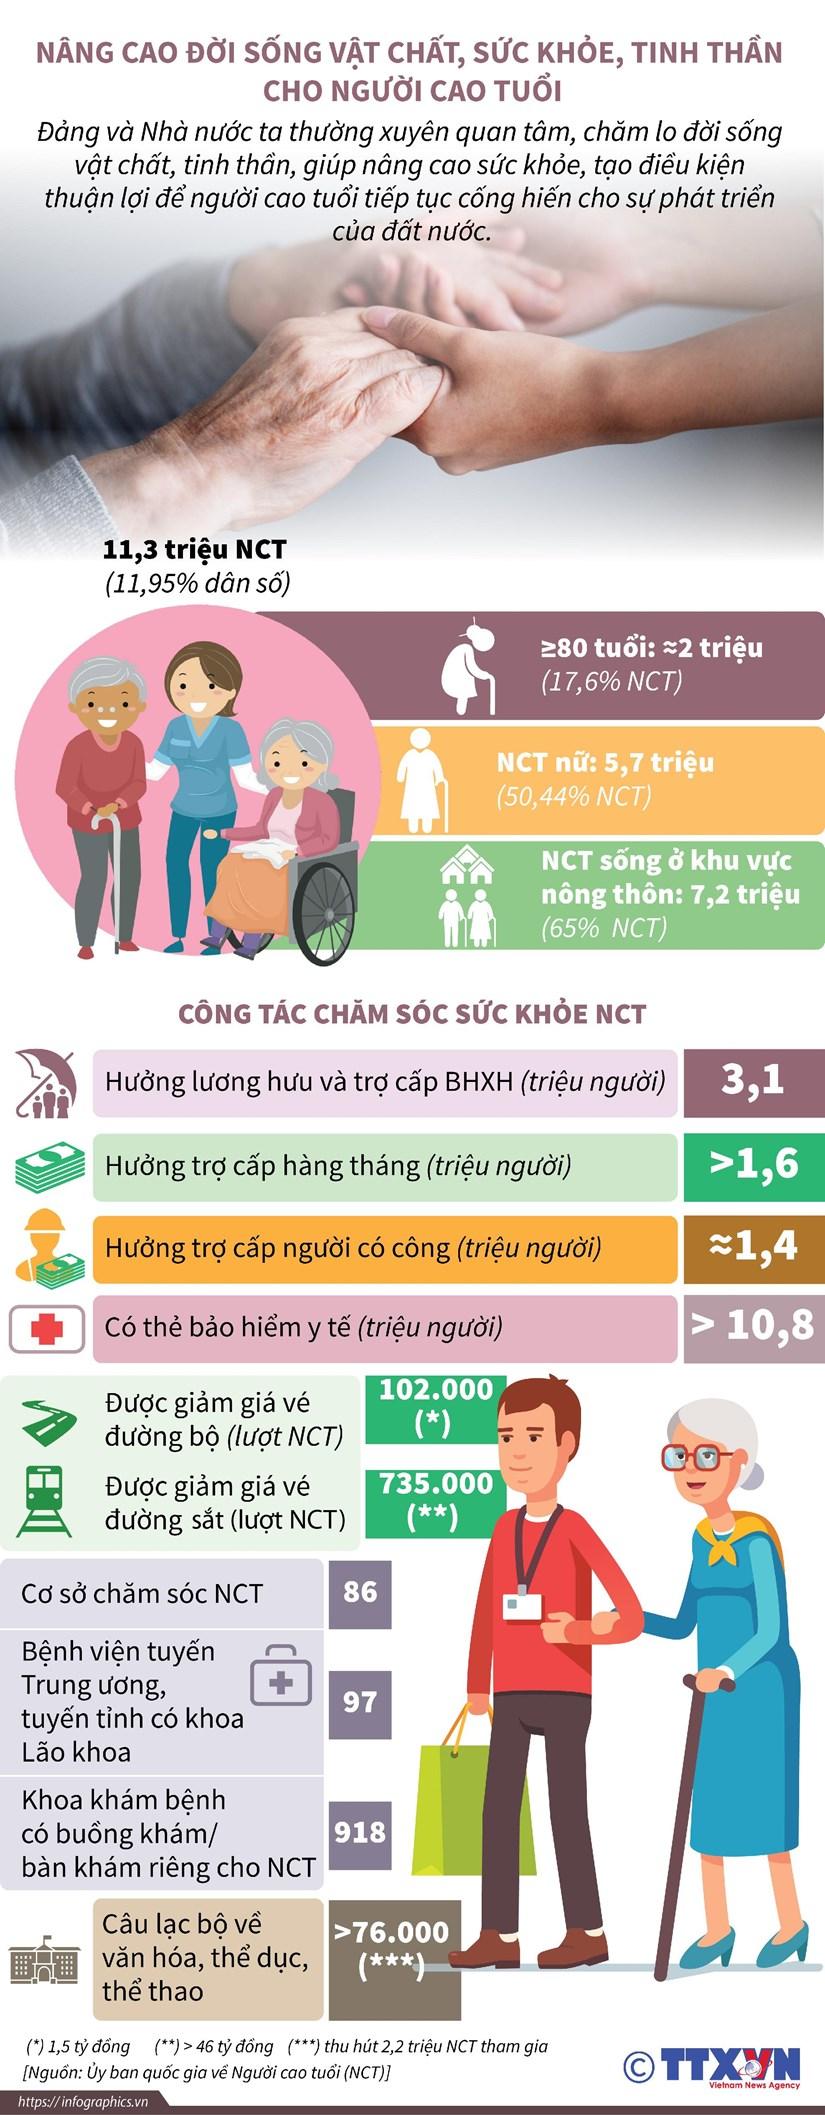 [Infographics] Nang cao doi song, tinh than cho nguoi cao tuoi hinh anh 1